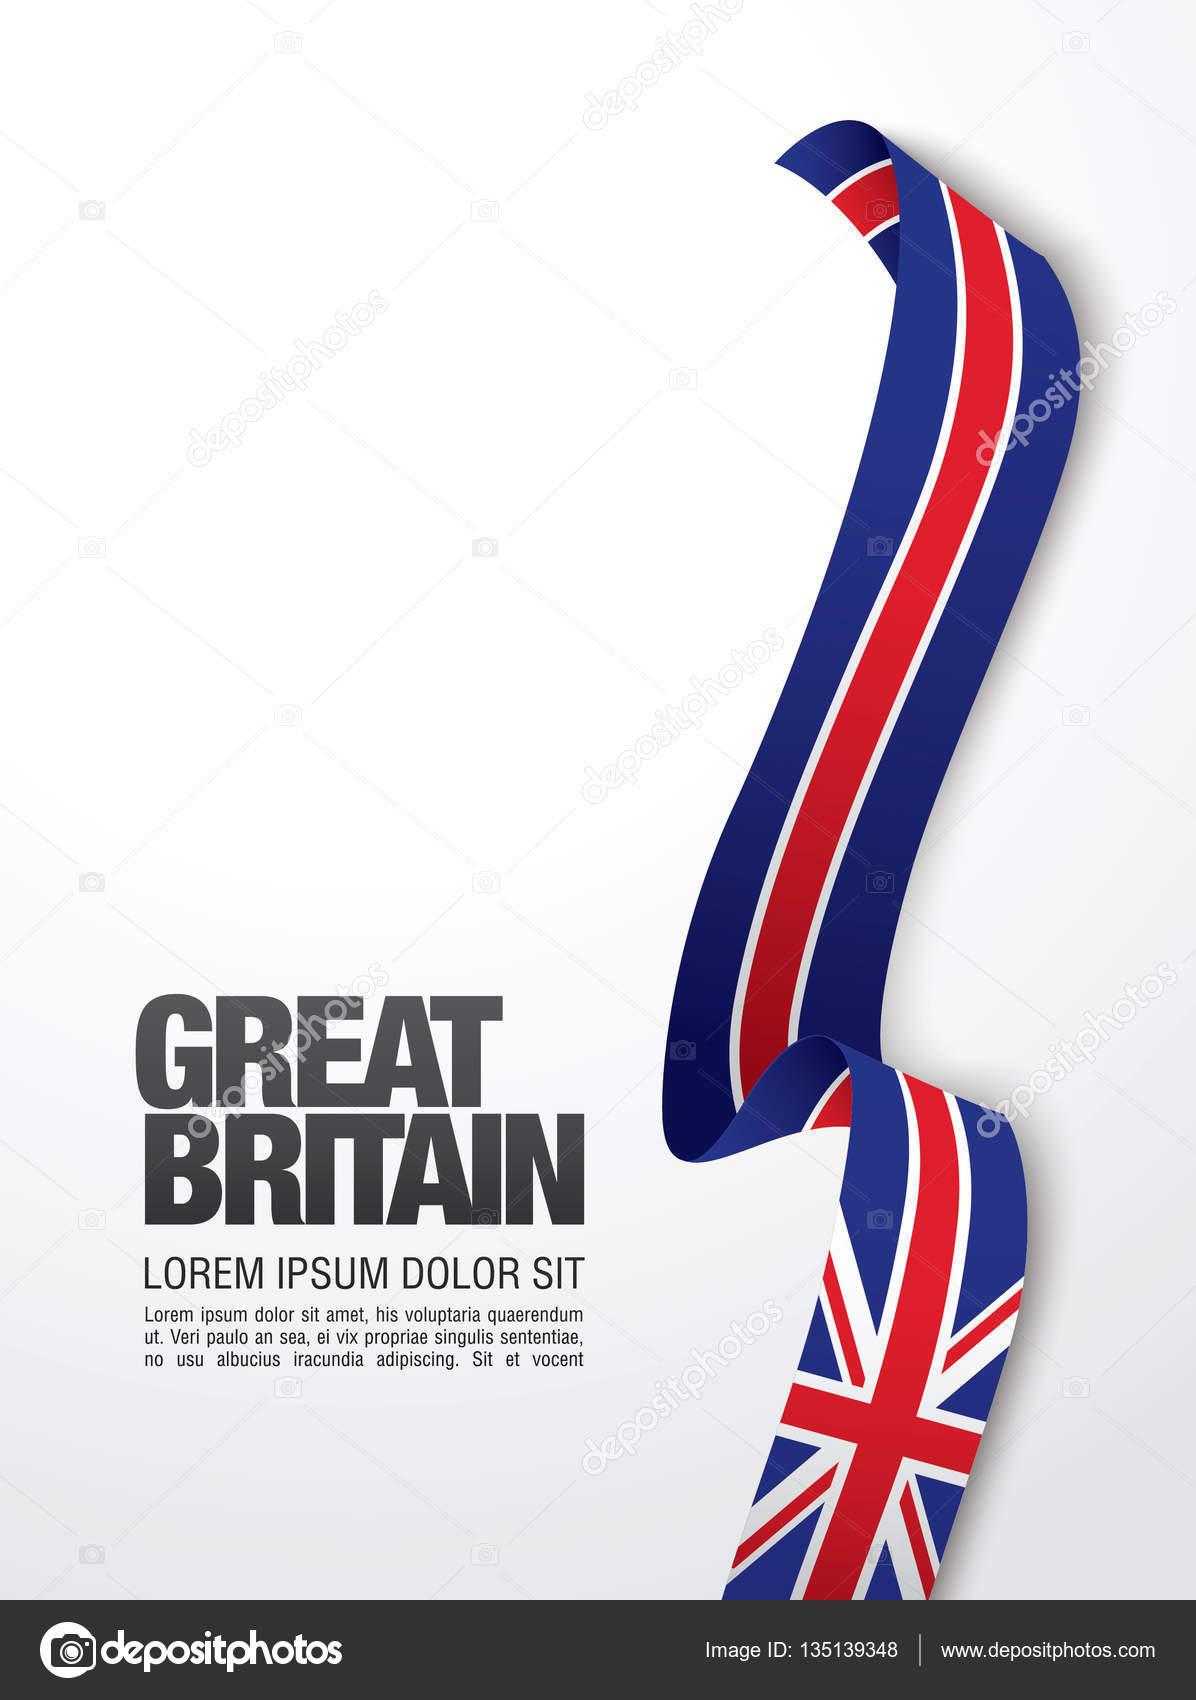 Großbritannien Flagge Vorlage — Stockvektor © Igor_Vkv #135139348